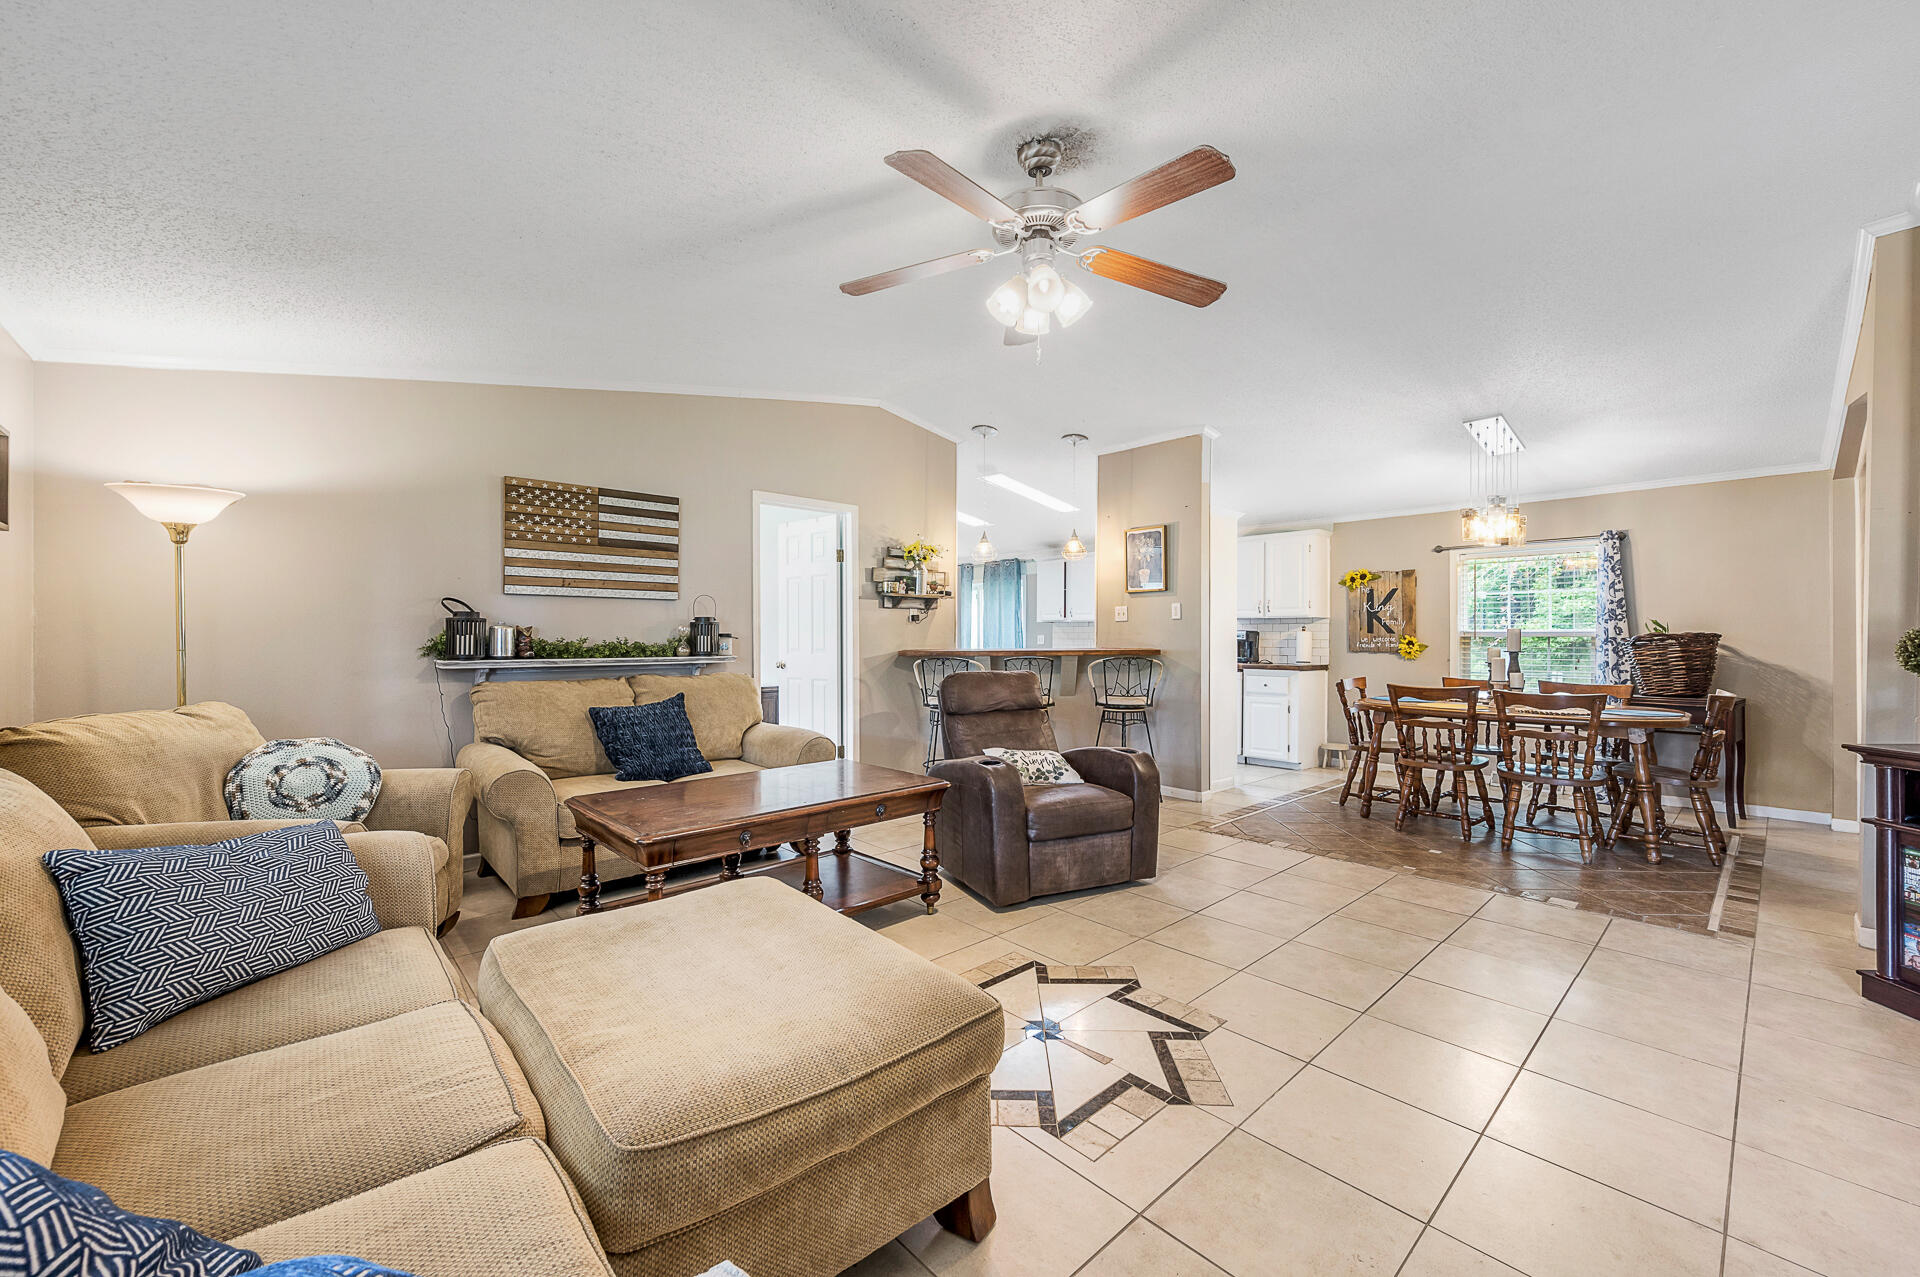 Clemson Terrace Homes For Sale - 250 Medina, Summerville, SC - 24